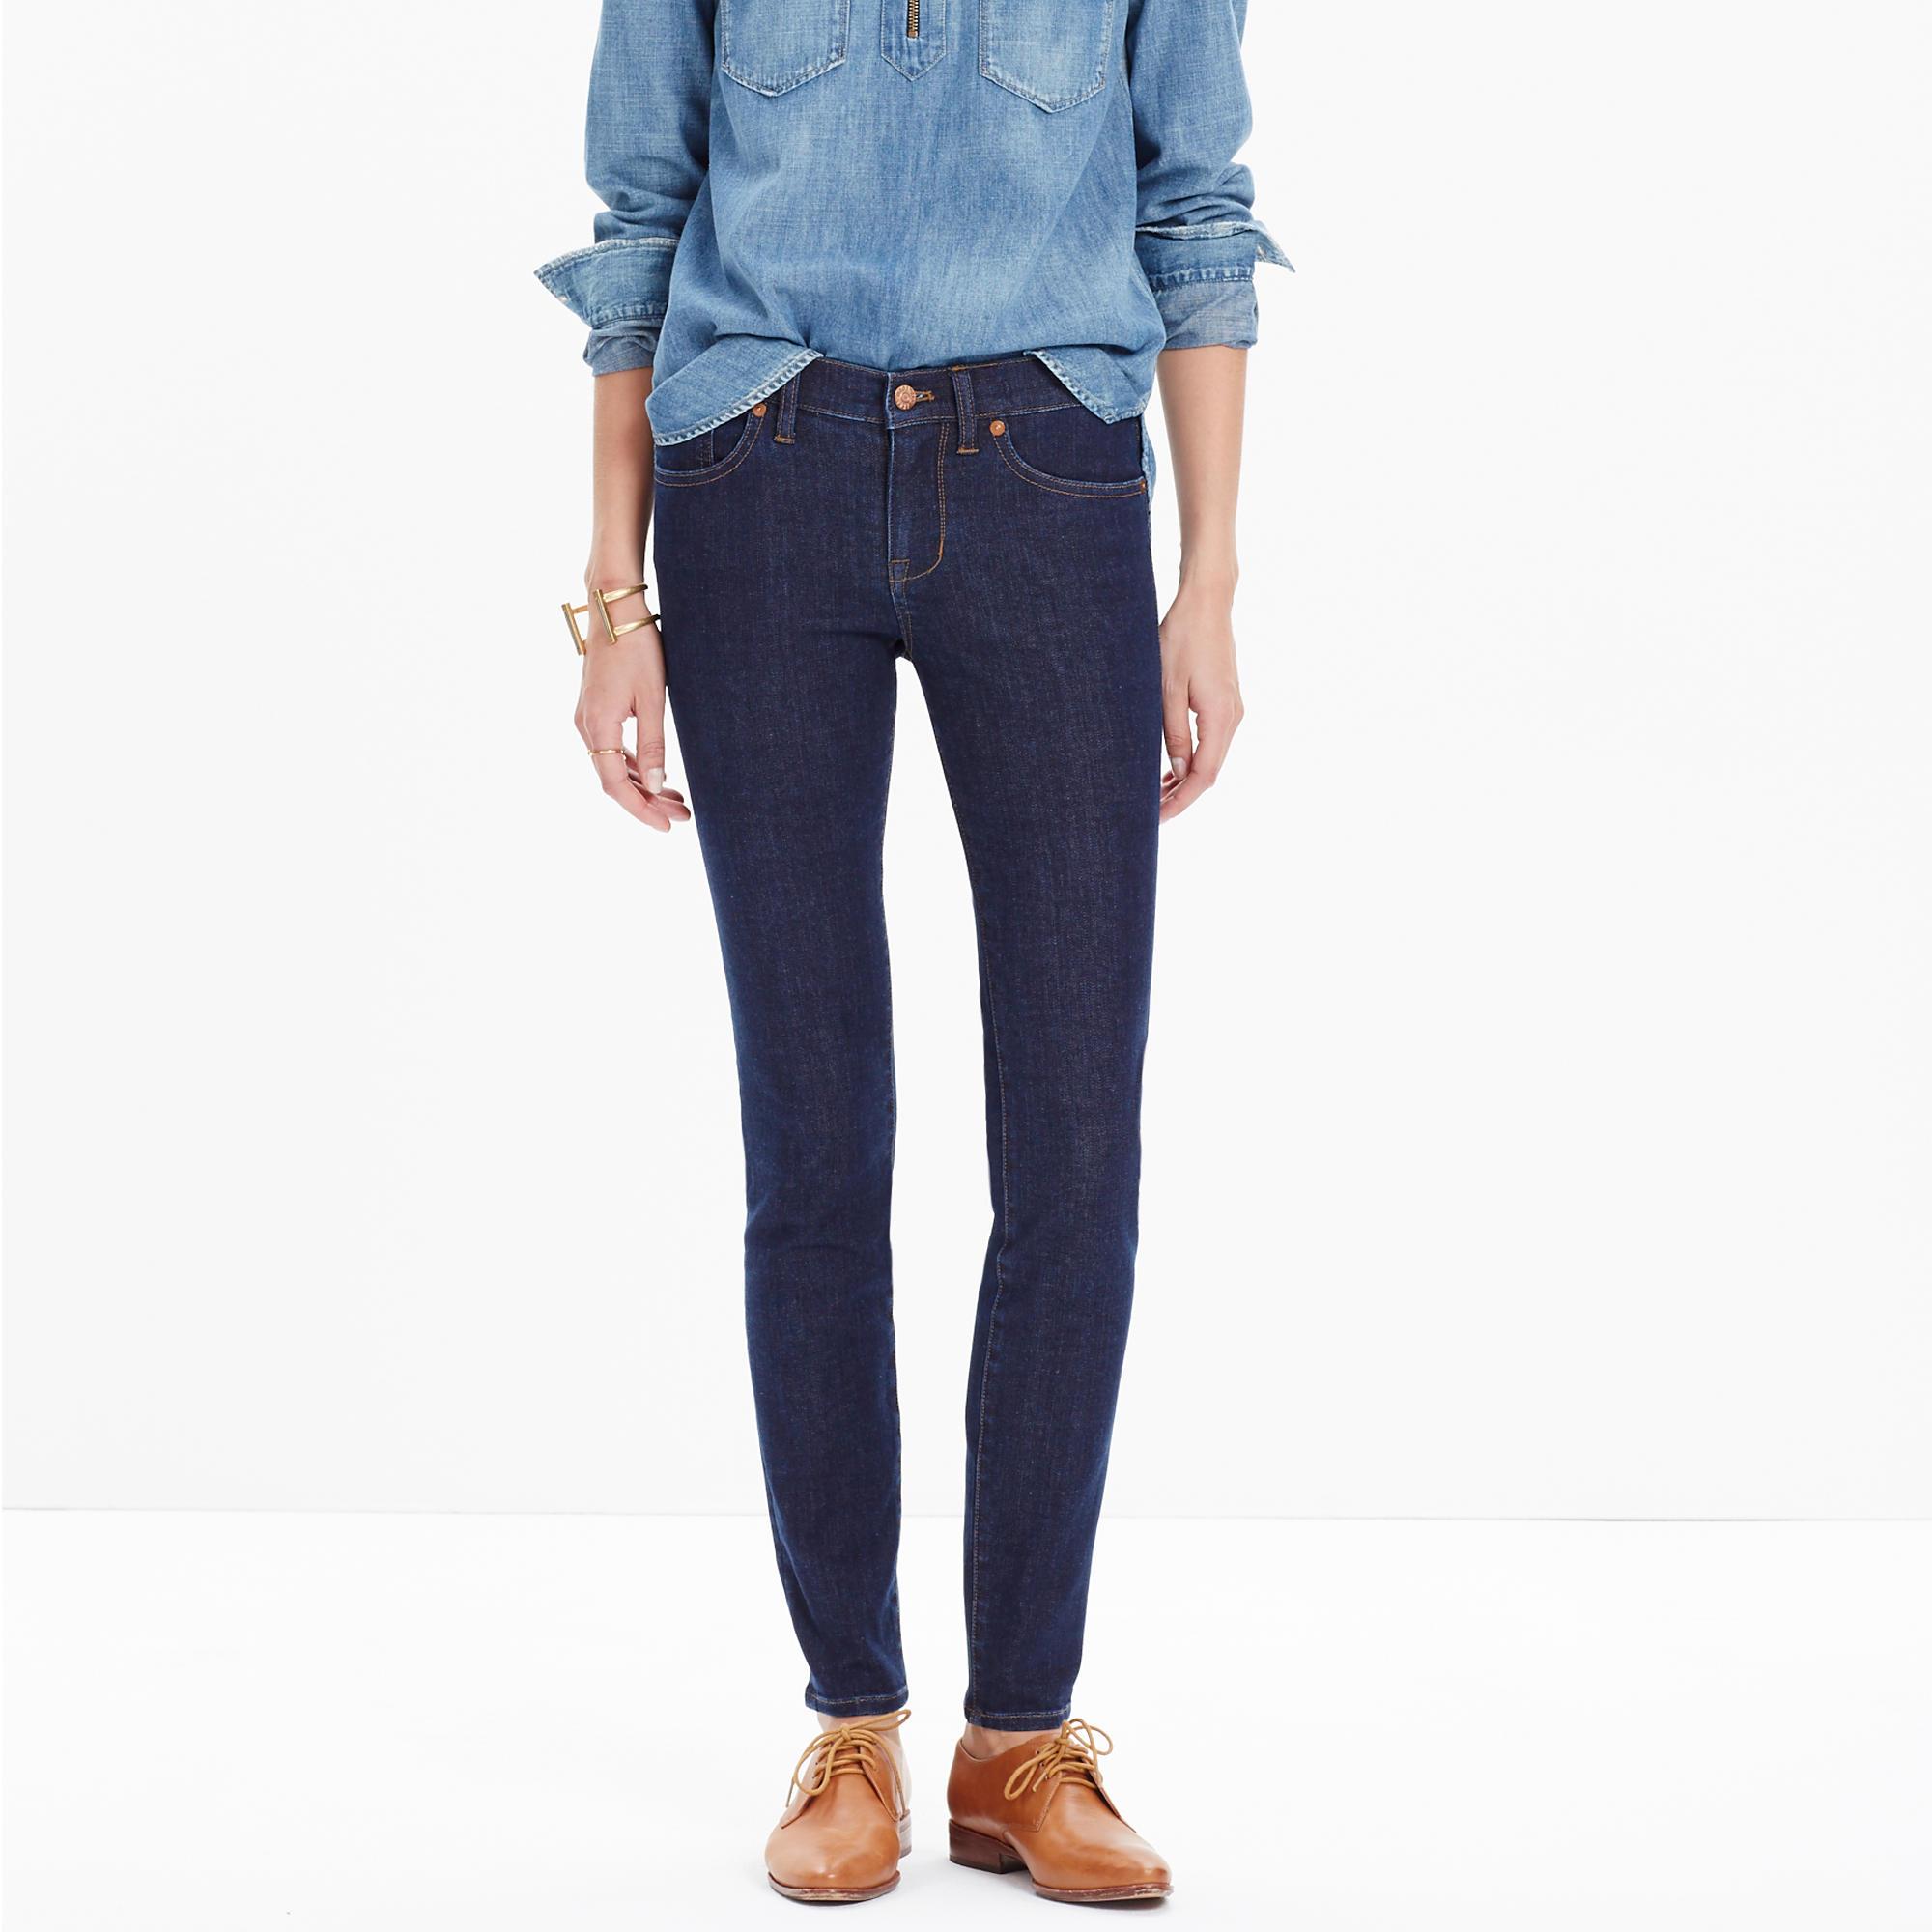 jeans.jpg